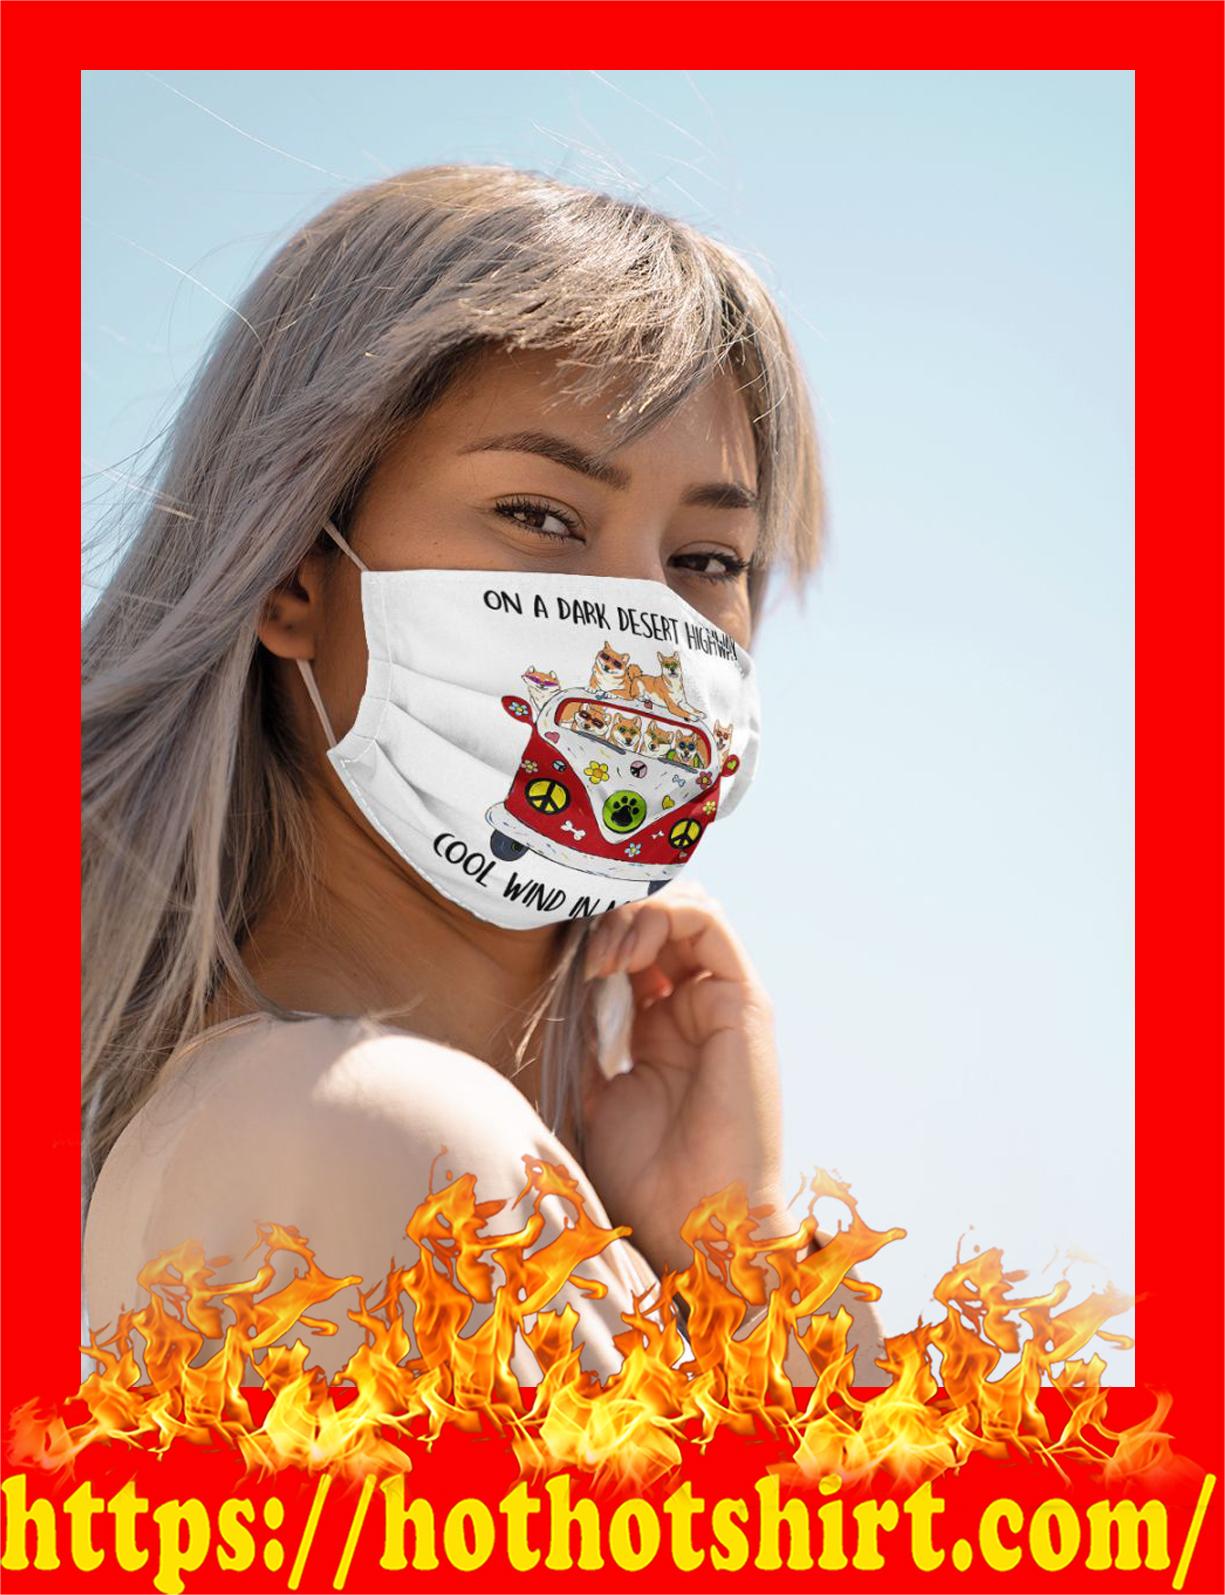 Akita dog On a dark desert highway cool wind in my hair cloth mask - detail